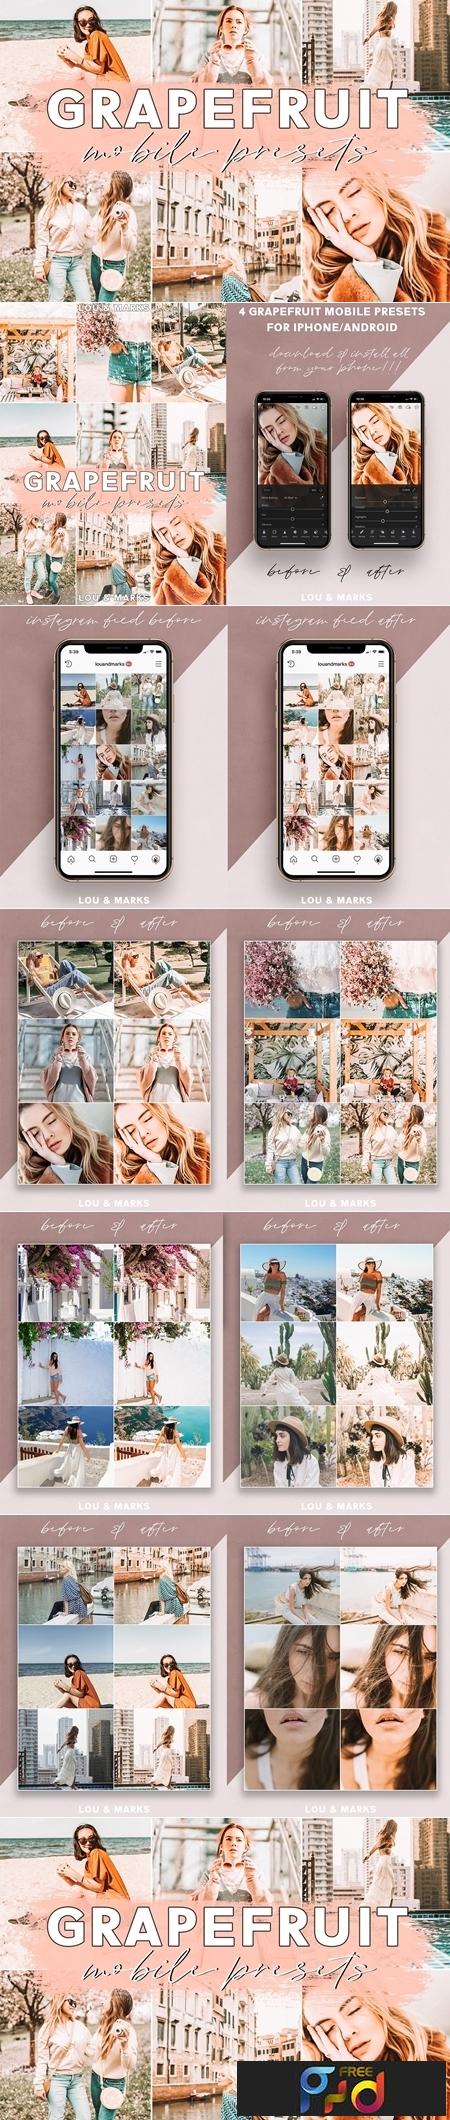 Grapefruit Blogger Mobile Presets 3621079 1